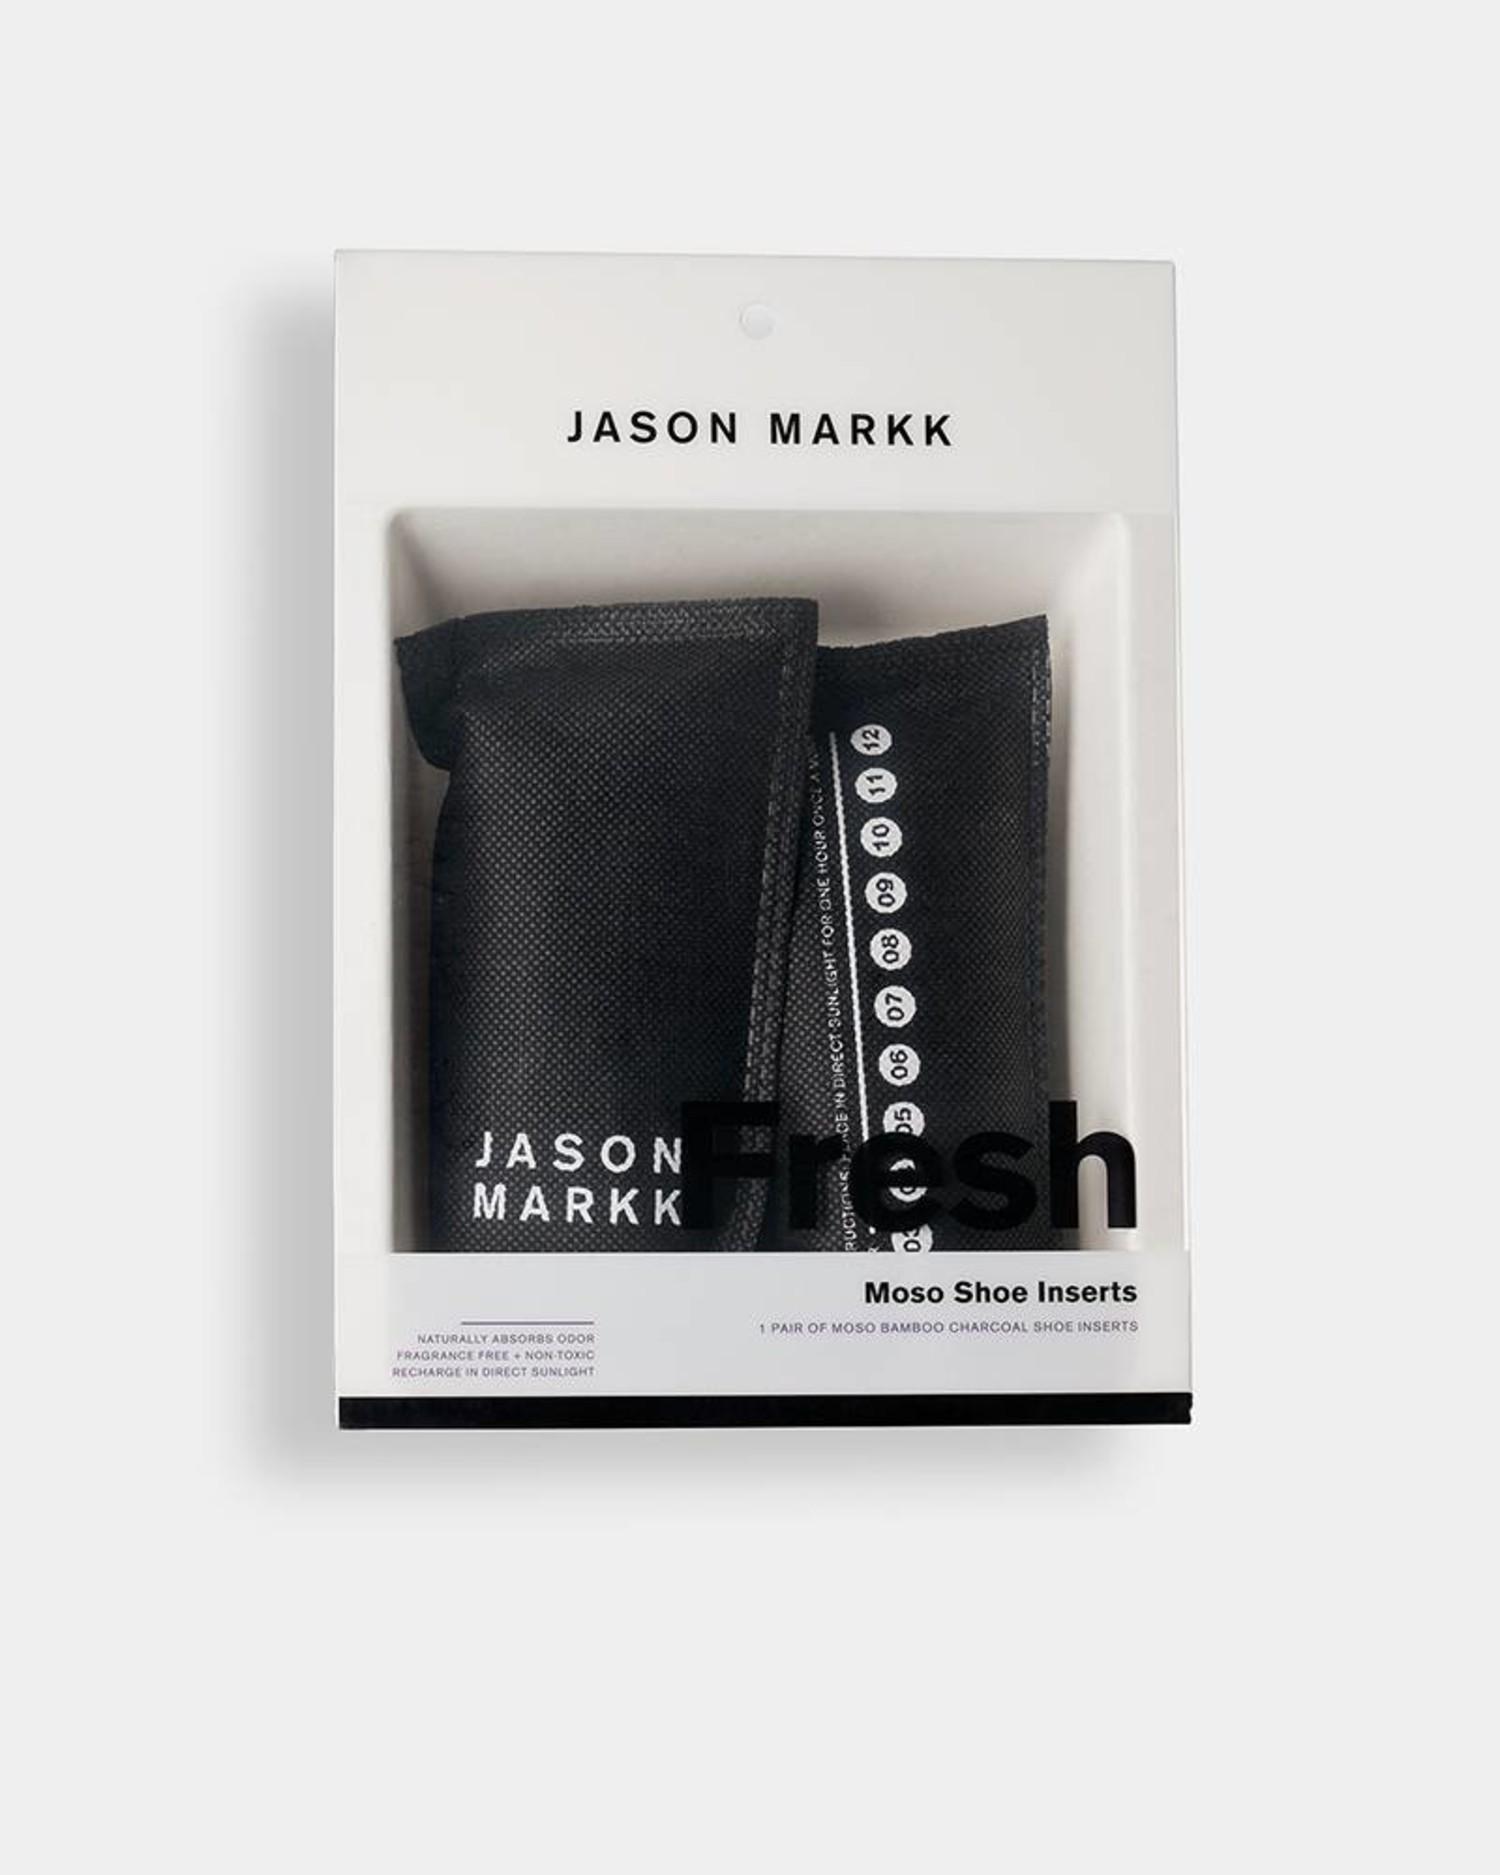 Jason Markk Moso Bamboo Charcoal Scented Inserts